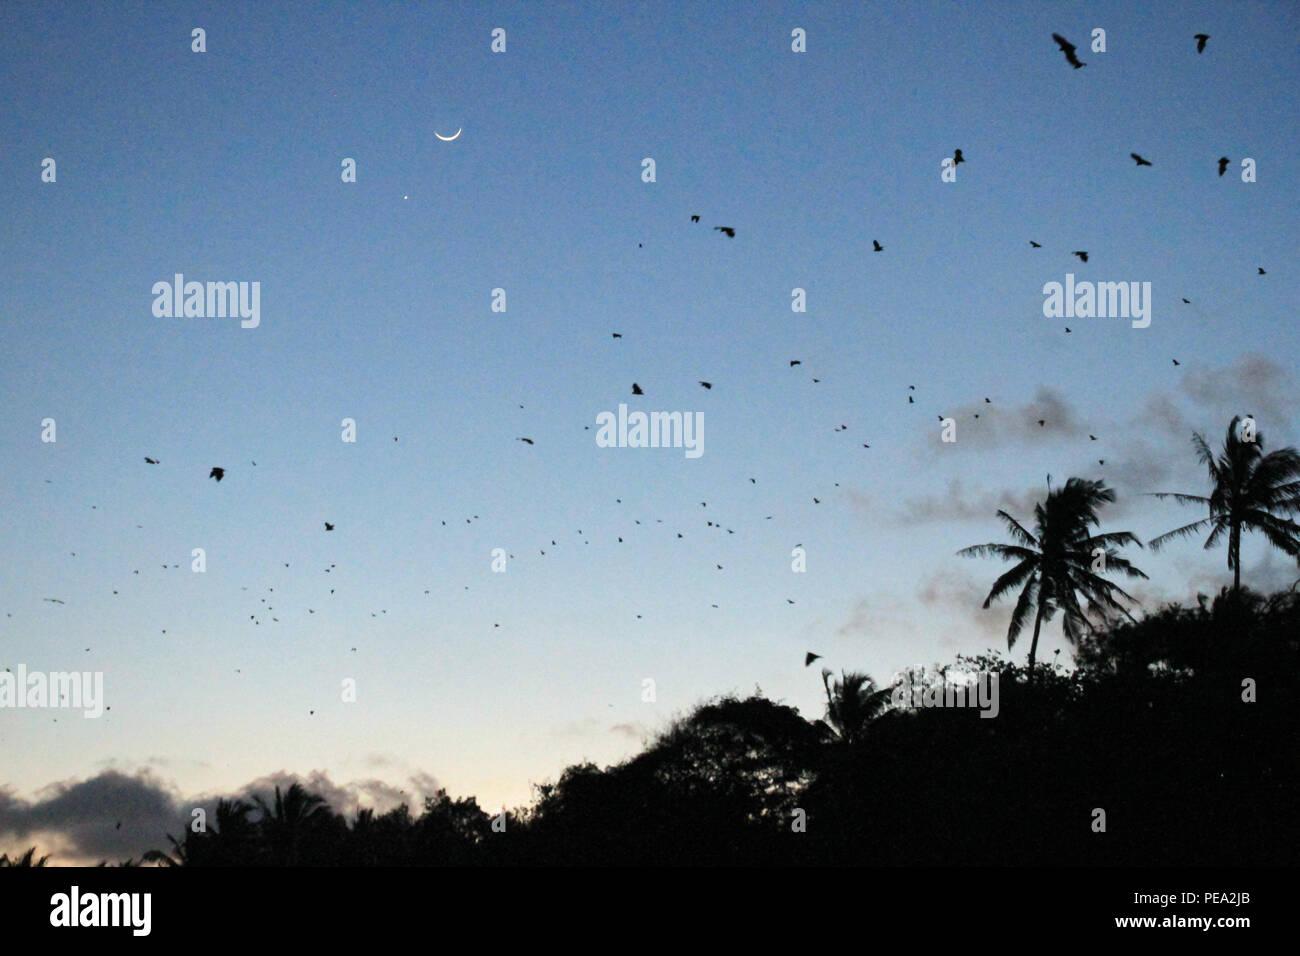 Bats flying on Mafia Island - Stock Image